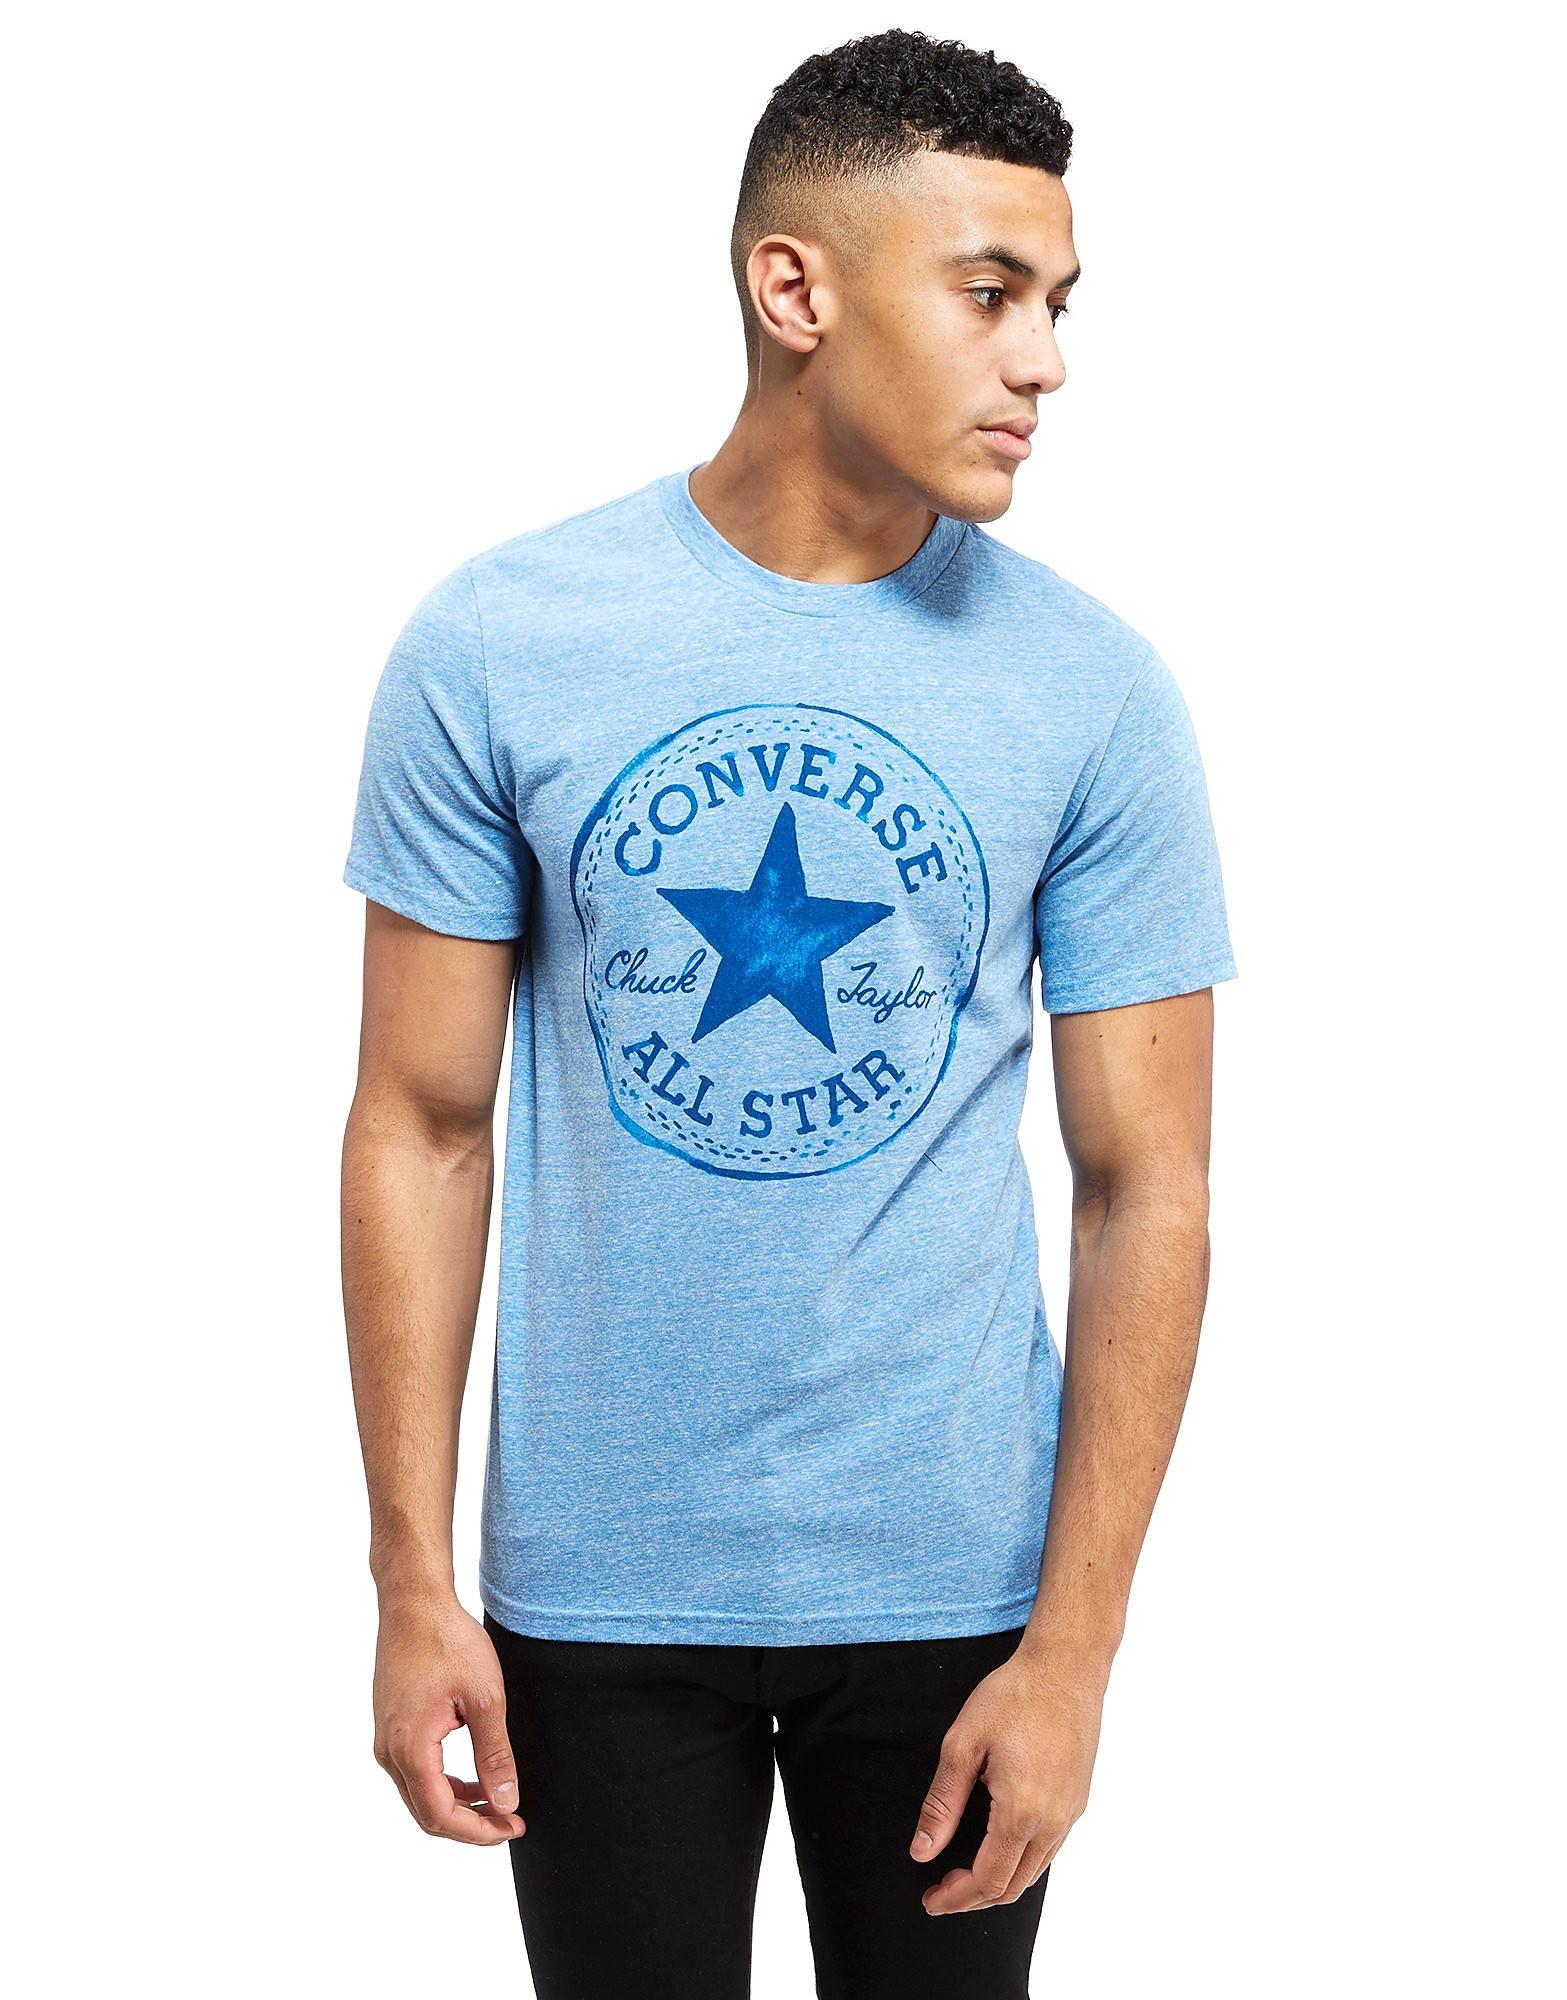 Converse T-shirt Chuck Taylor Patch Homme